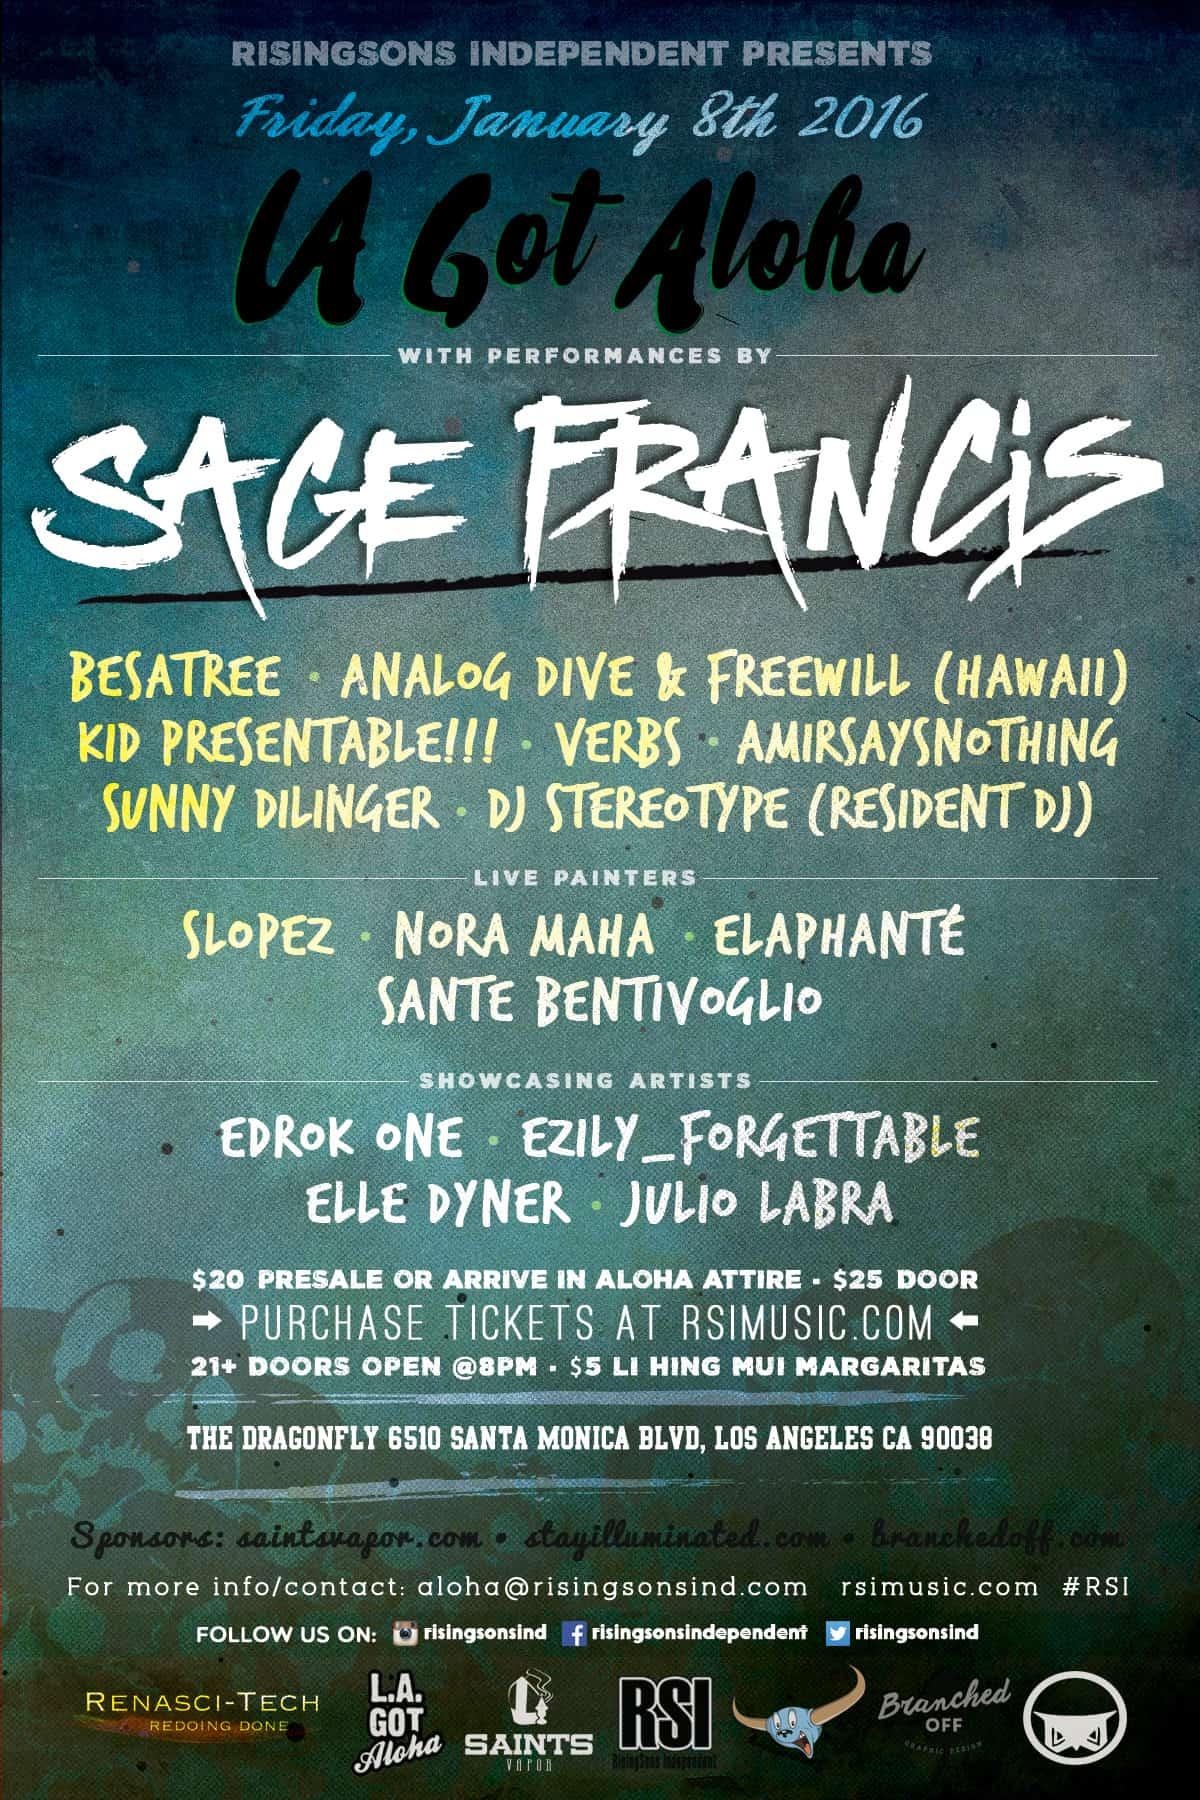 lagotaloha - sage francis - flyer design